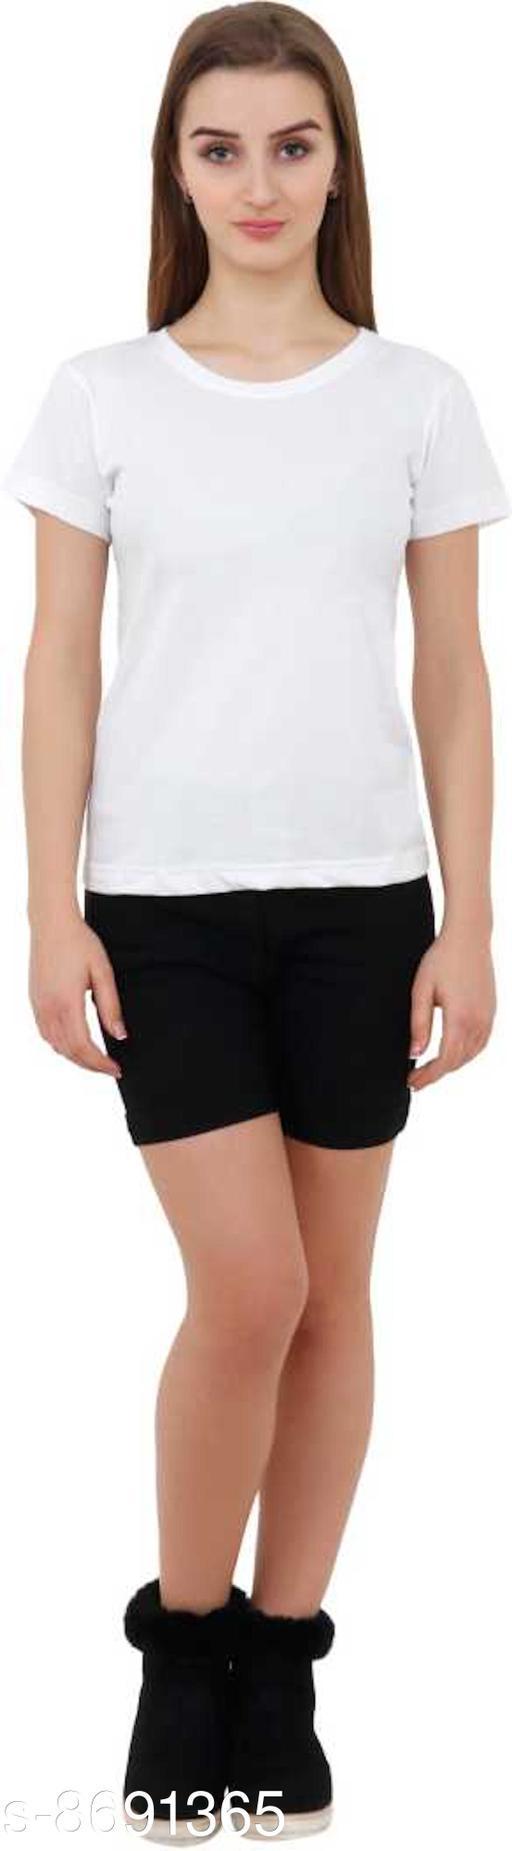 Active Topwear Women Active Topwear  *Fabric* Cotton  *Multipack* 1  *Sizes*  S, XL, L, M  *Sizes Available* S, M, L, XL *    Catalog Name: Fancy Women Sports & Activewear Tops CatalogID_1480307 C79-SC1407 Code: 214-8691365-